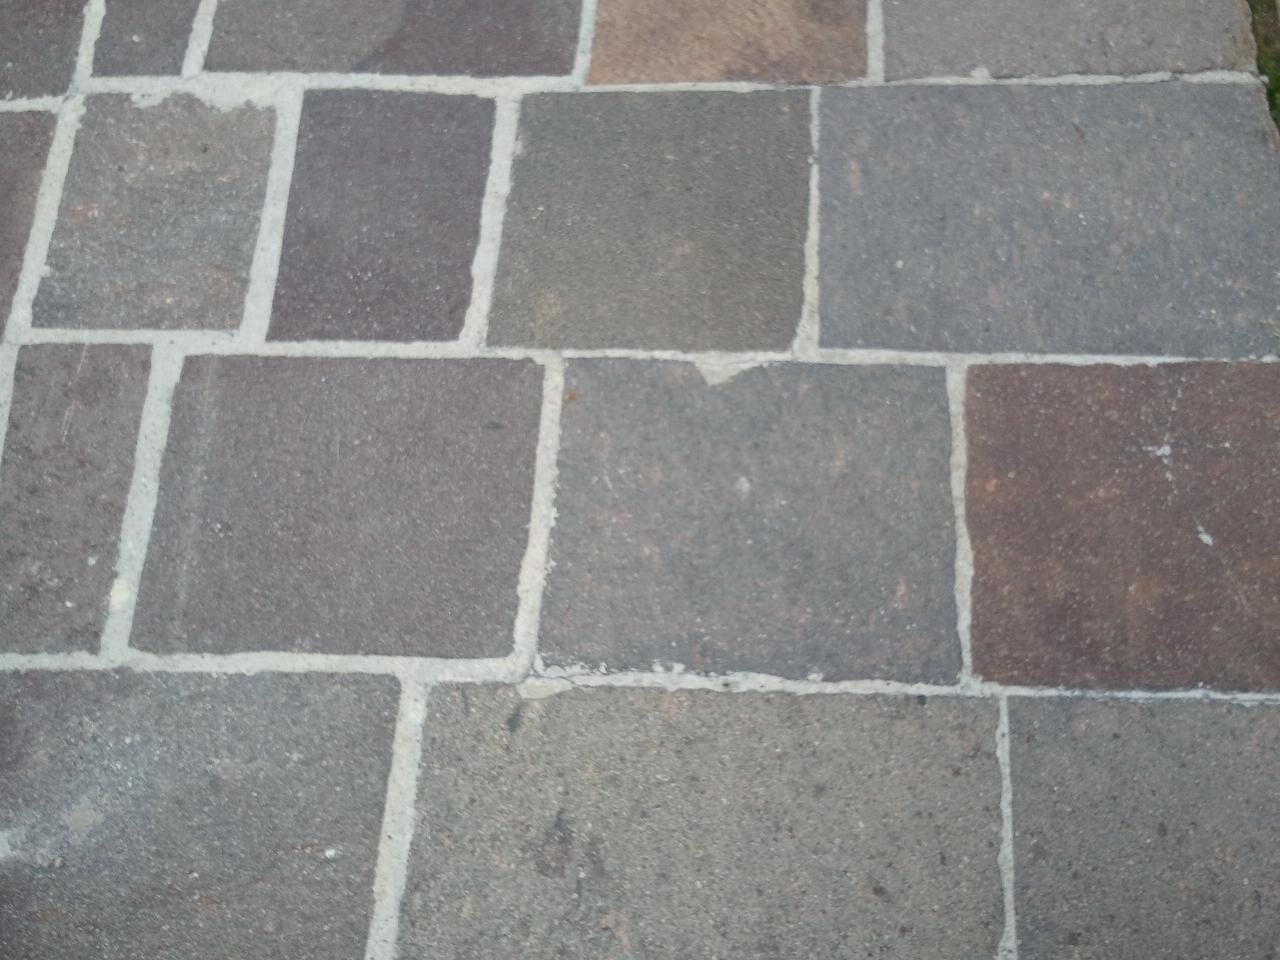 Leroy merlin piastrelle per esterno leroy merlin - Piastrelle pavimento esterno ...